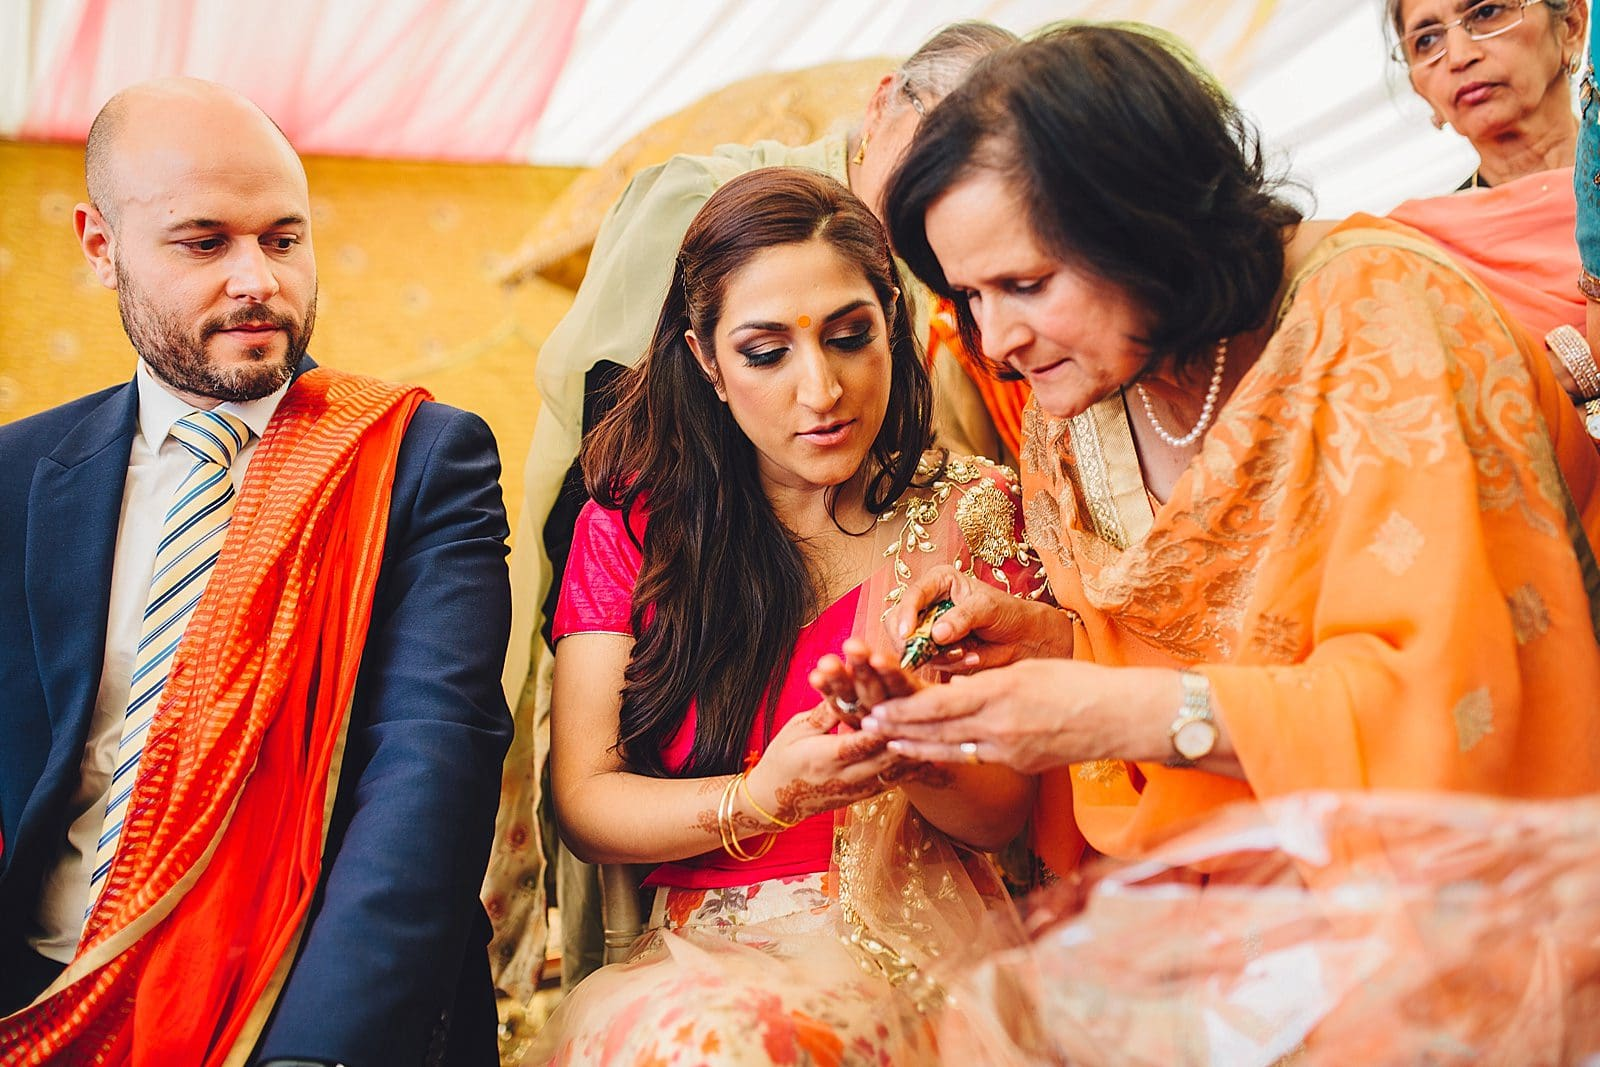 sikh-wedding-photography-birmingham-edgbaston_0087